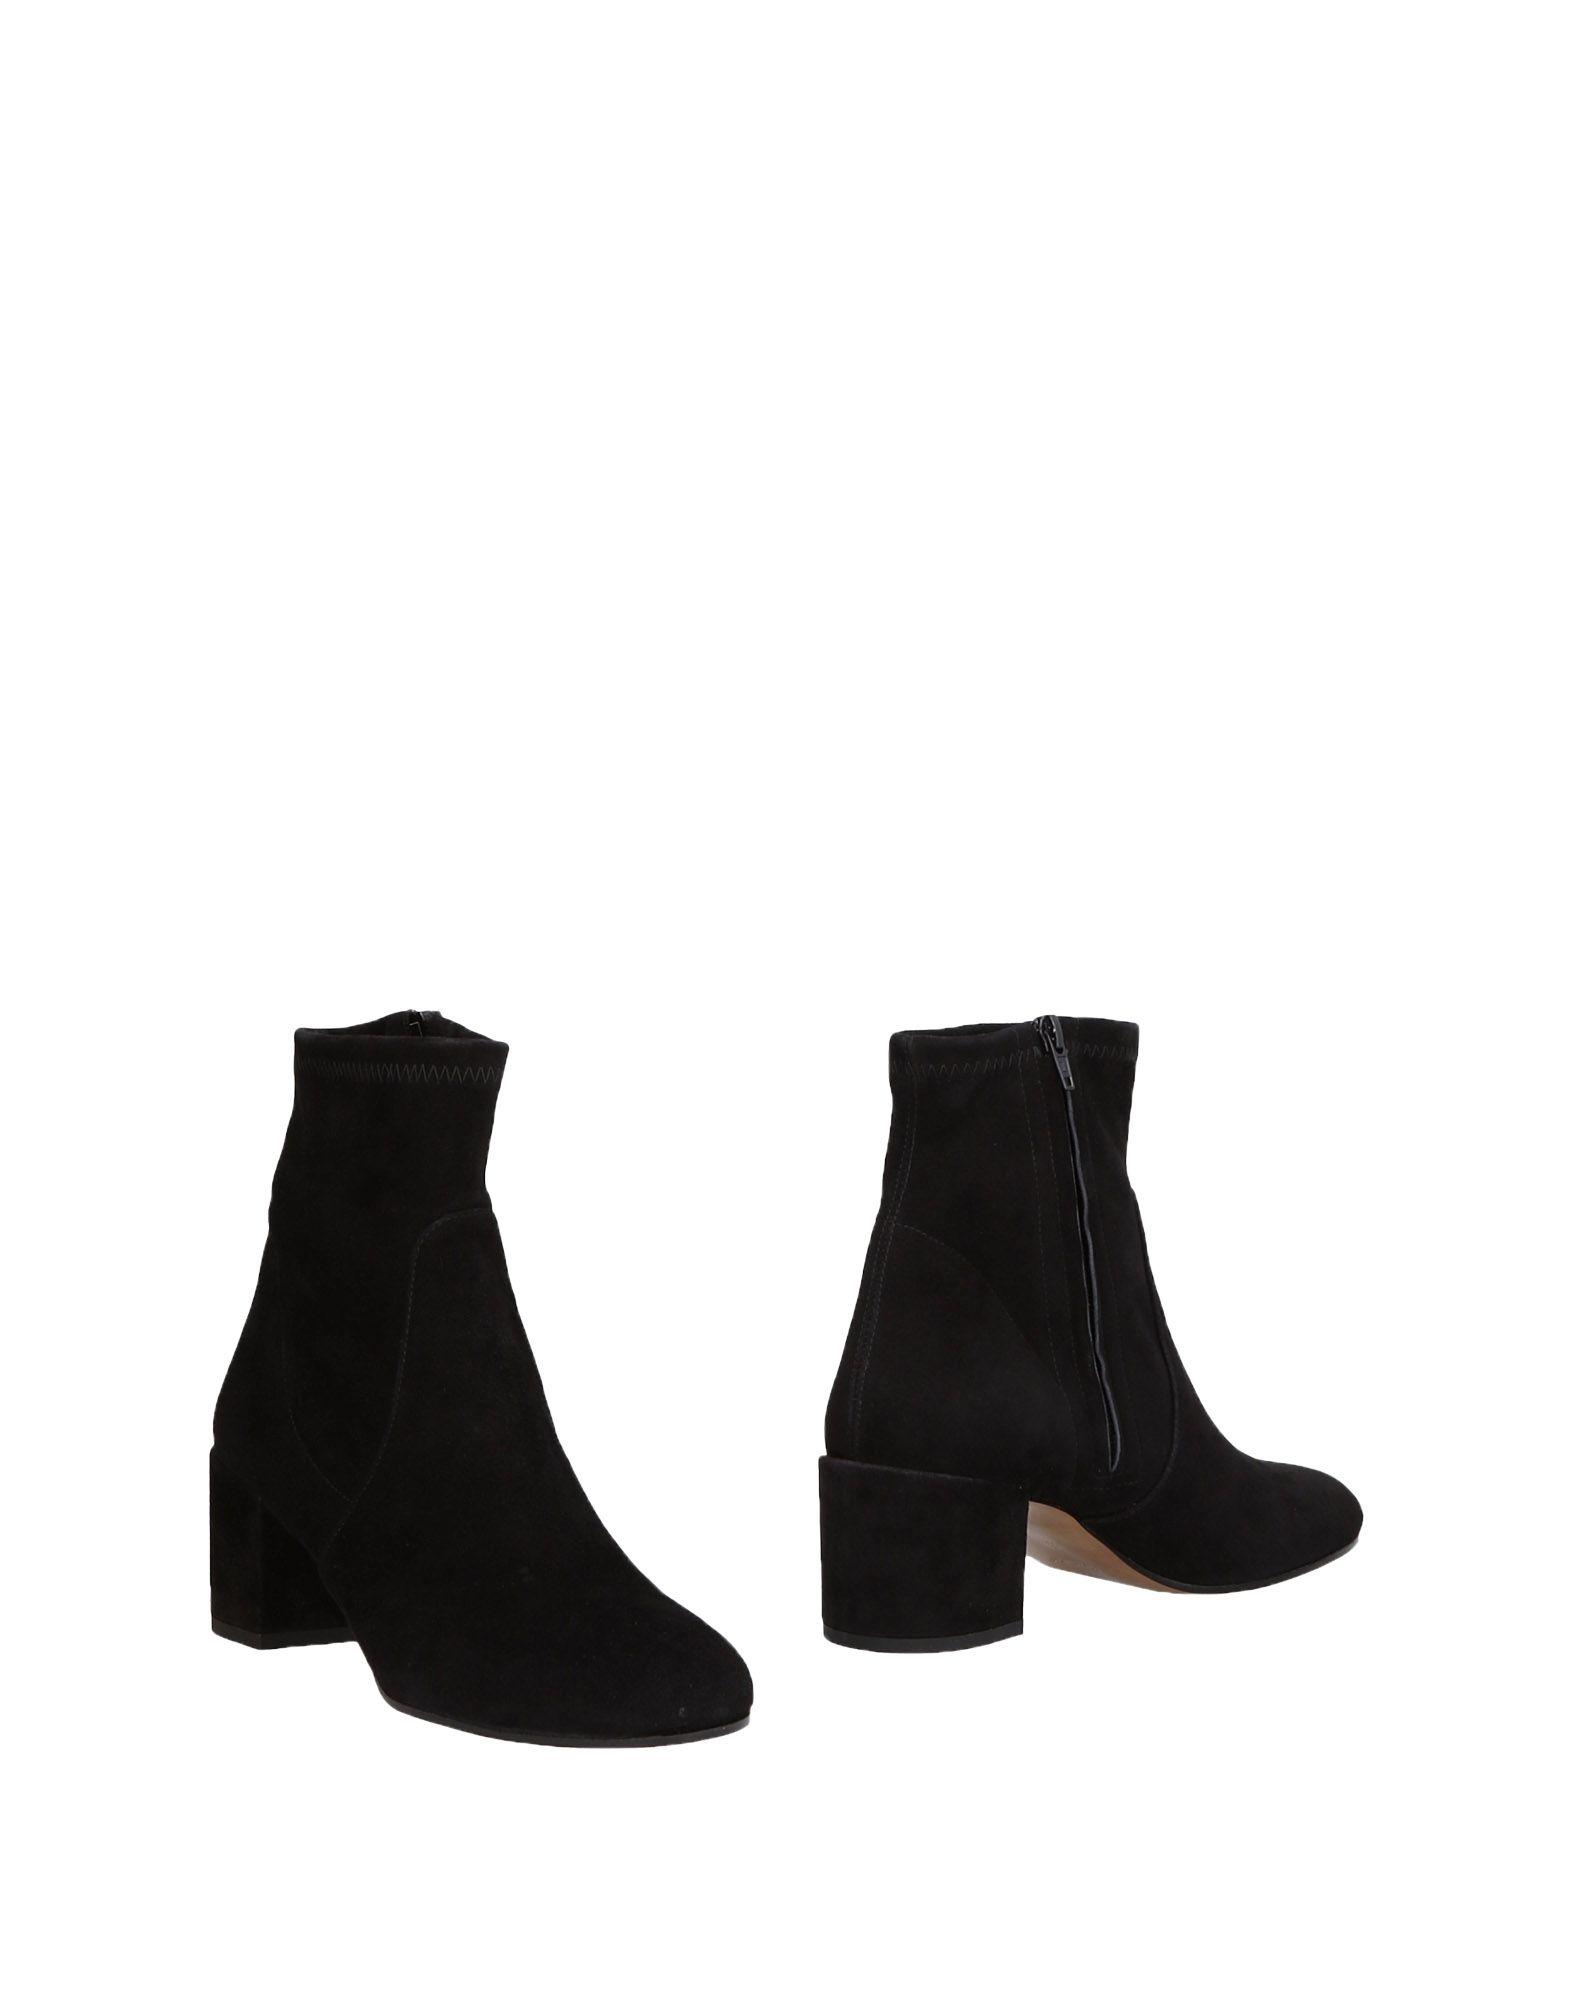 Bianca 11471122XB Di Stiefelette Damen  11471122XB Bianca Gute Qualität beliebte Schuhe ed1eee